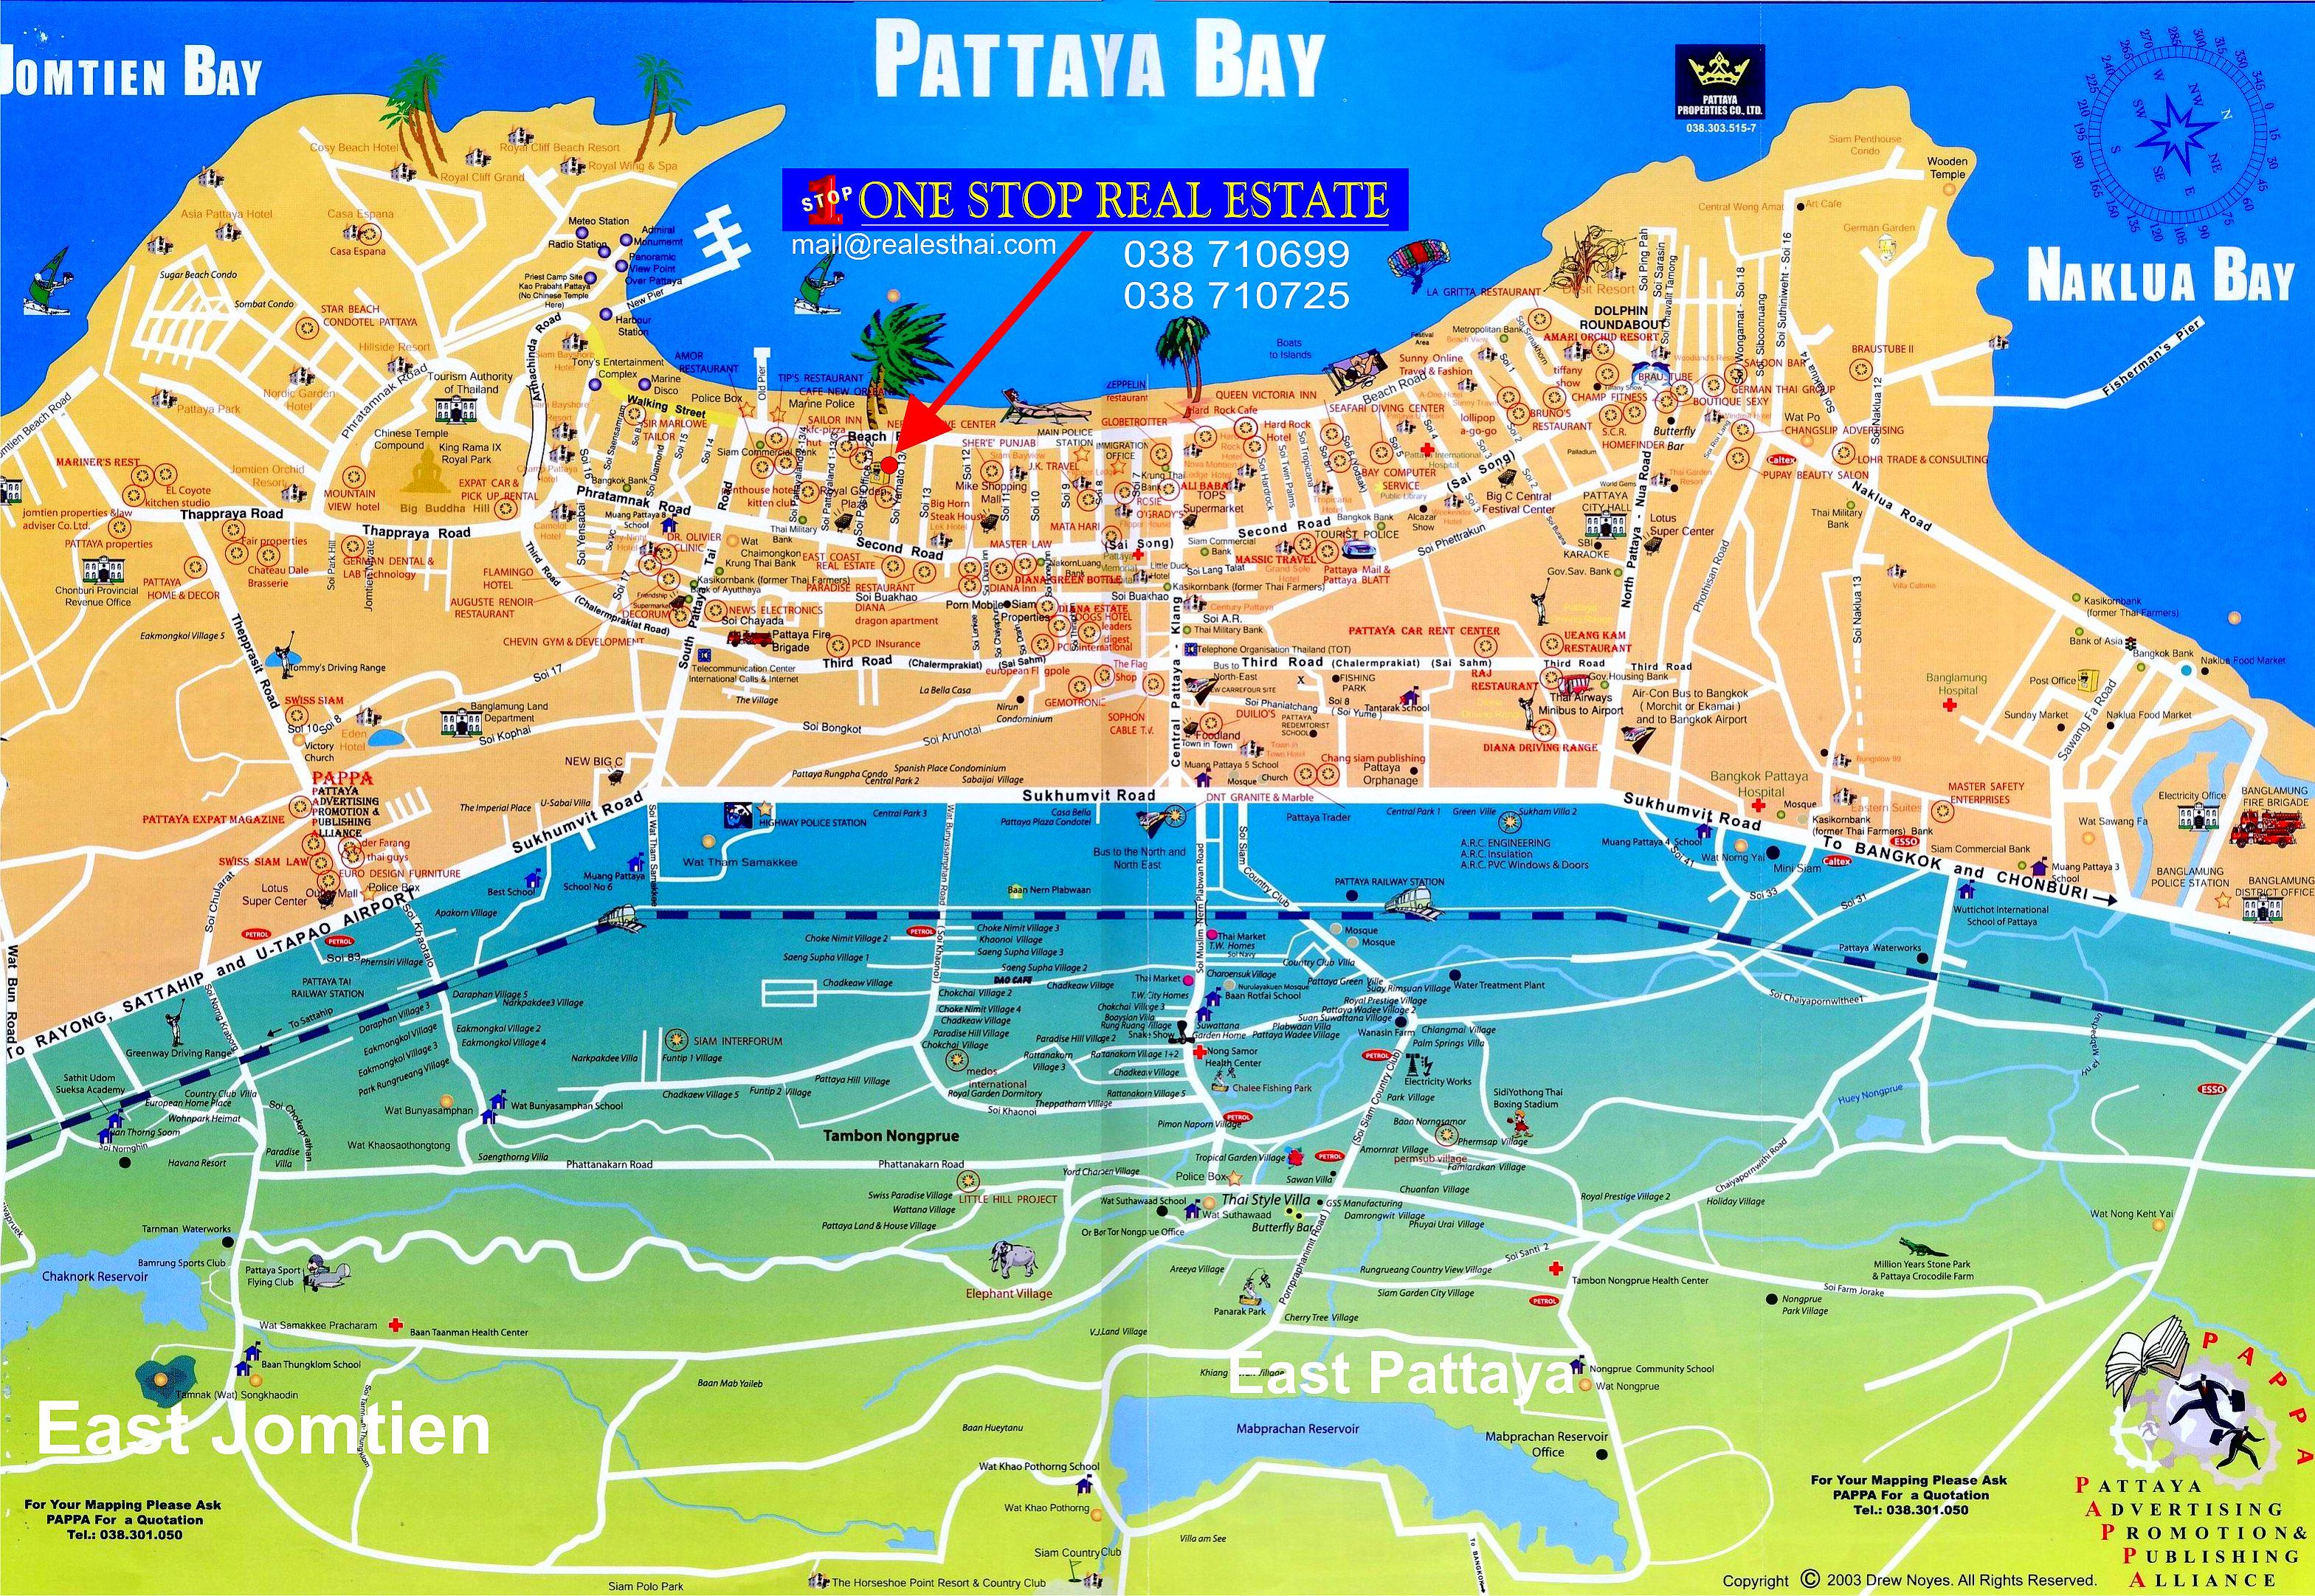 Thailand Villas For Rent Pattaya